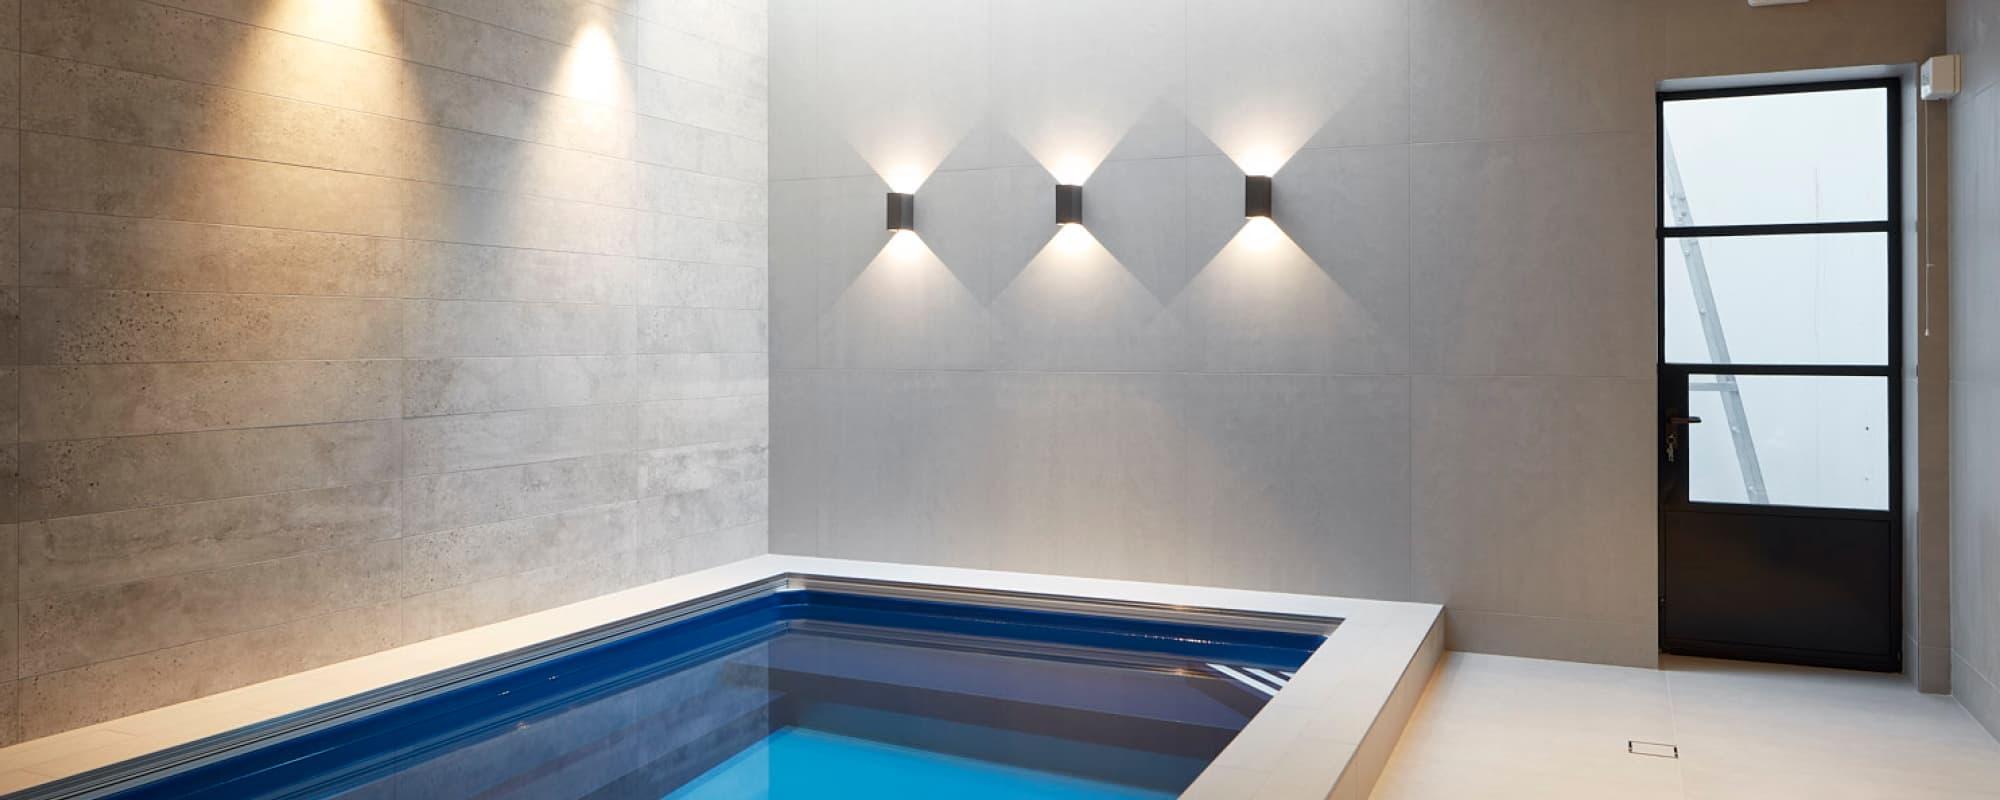 Basement conversion - Swimming pool